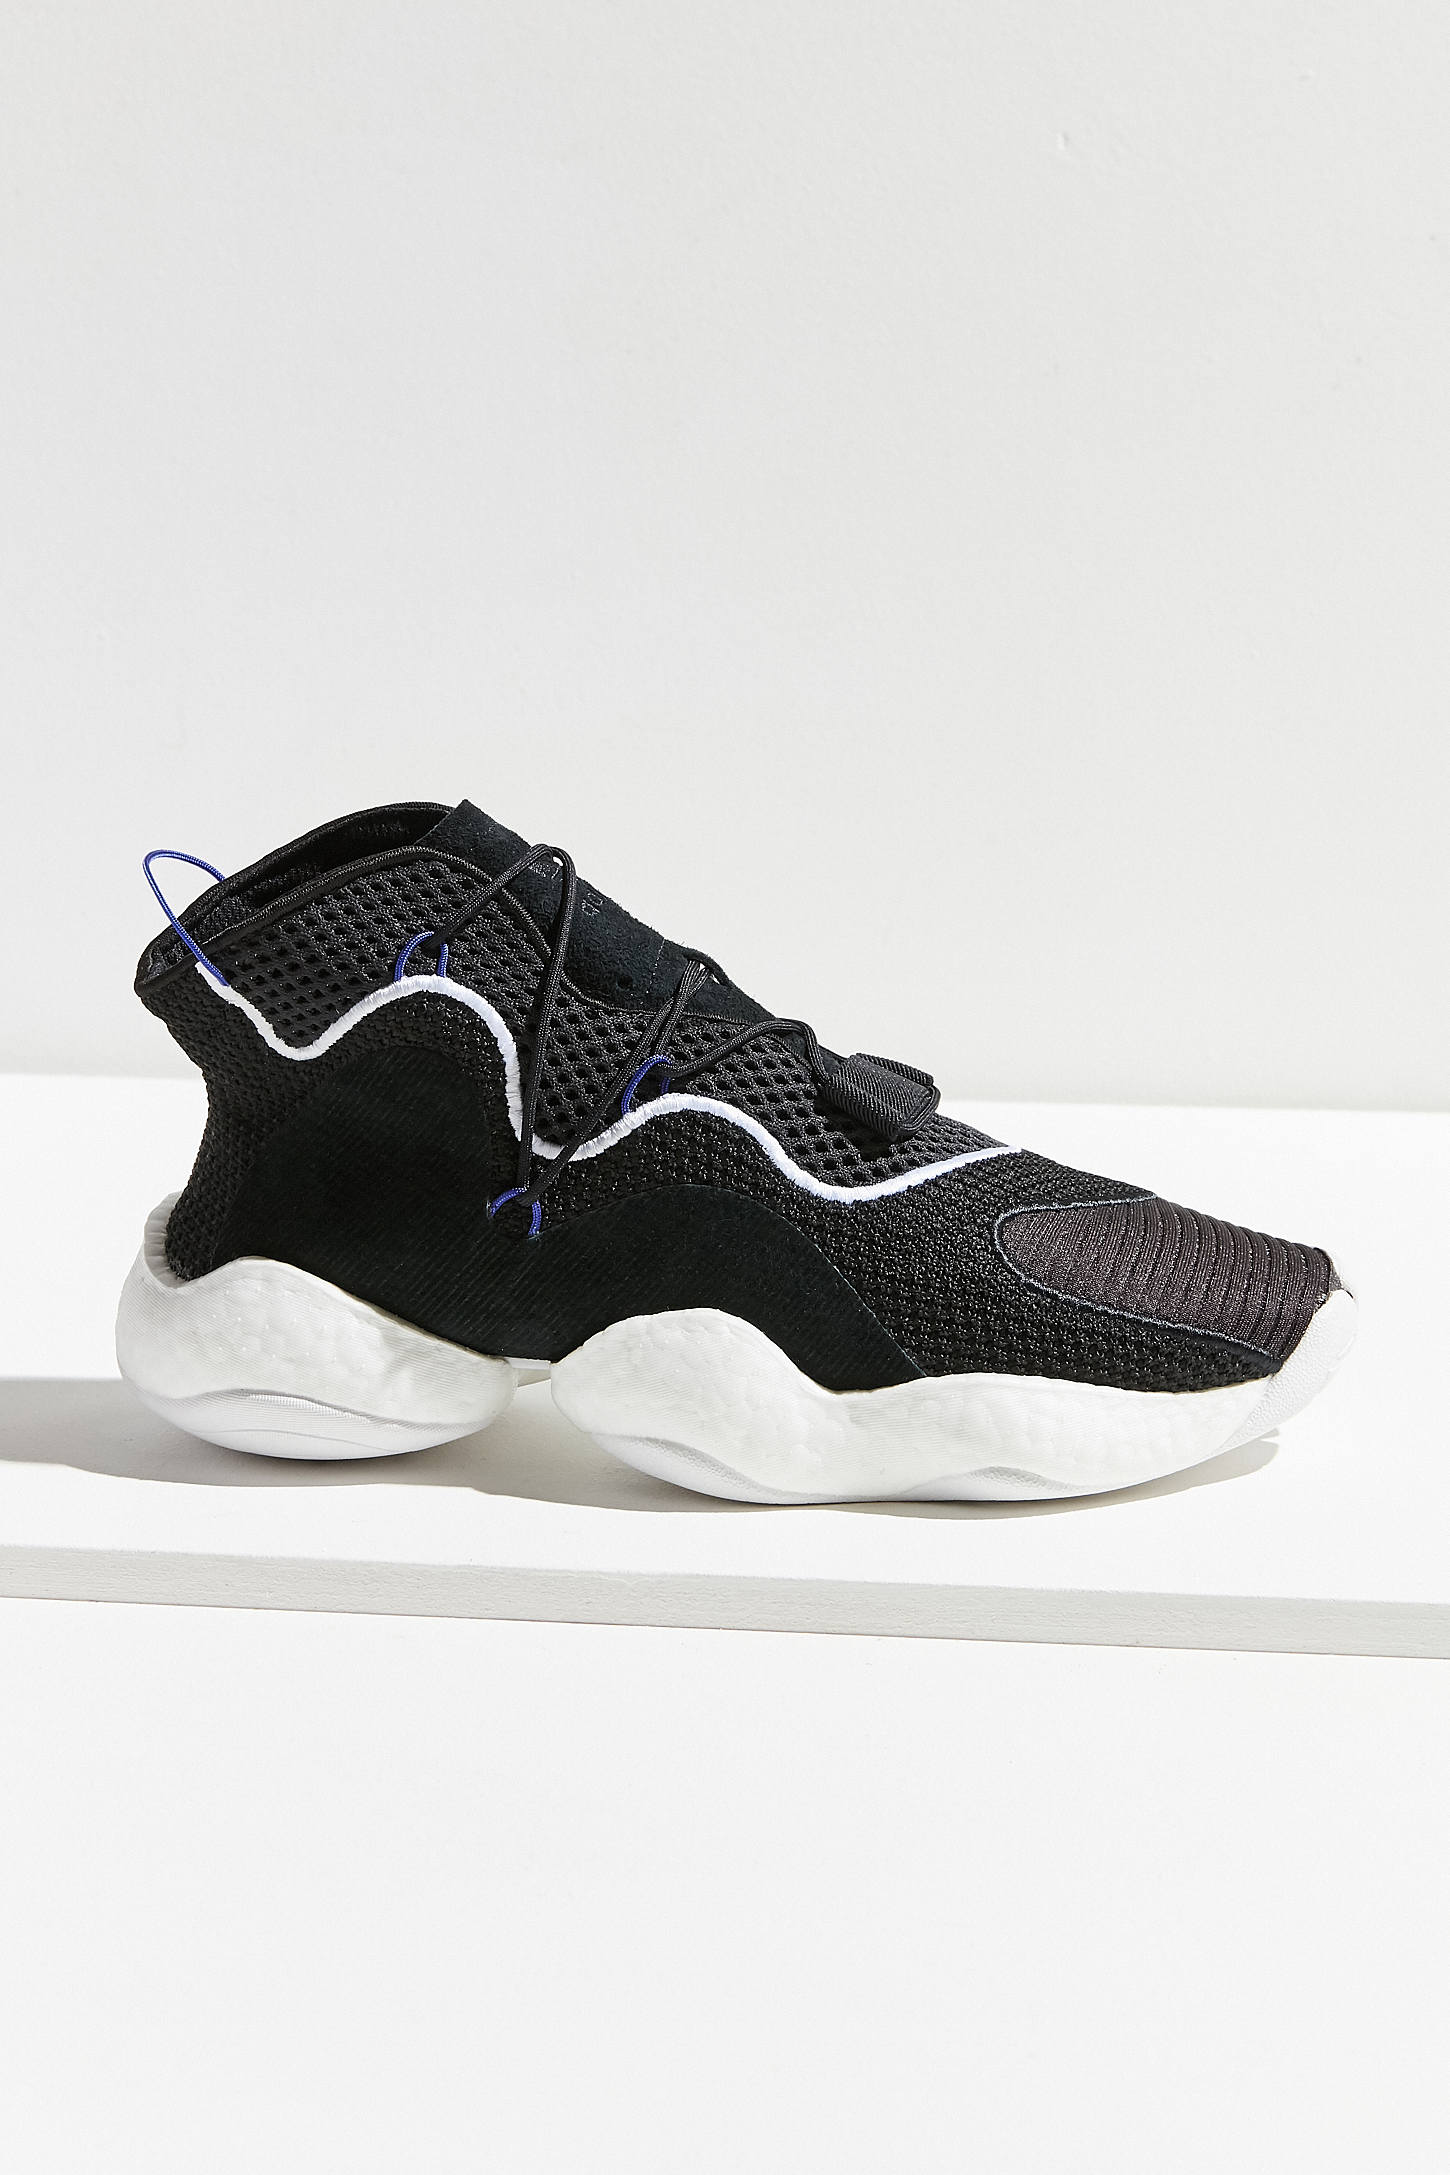 Adidas Pazzo Byw Livello 1 Impulso Scarpe Urban Outfitters